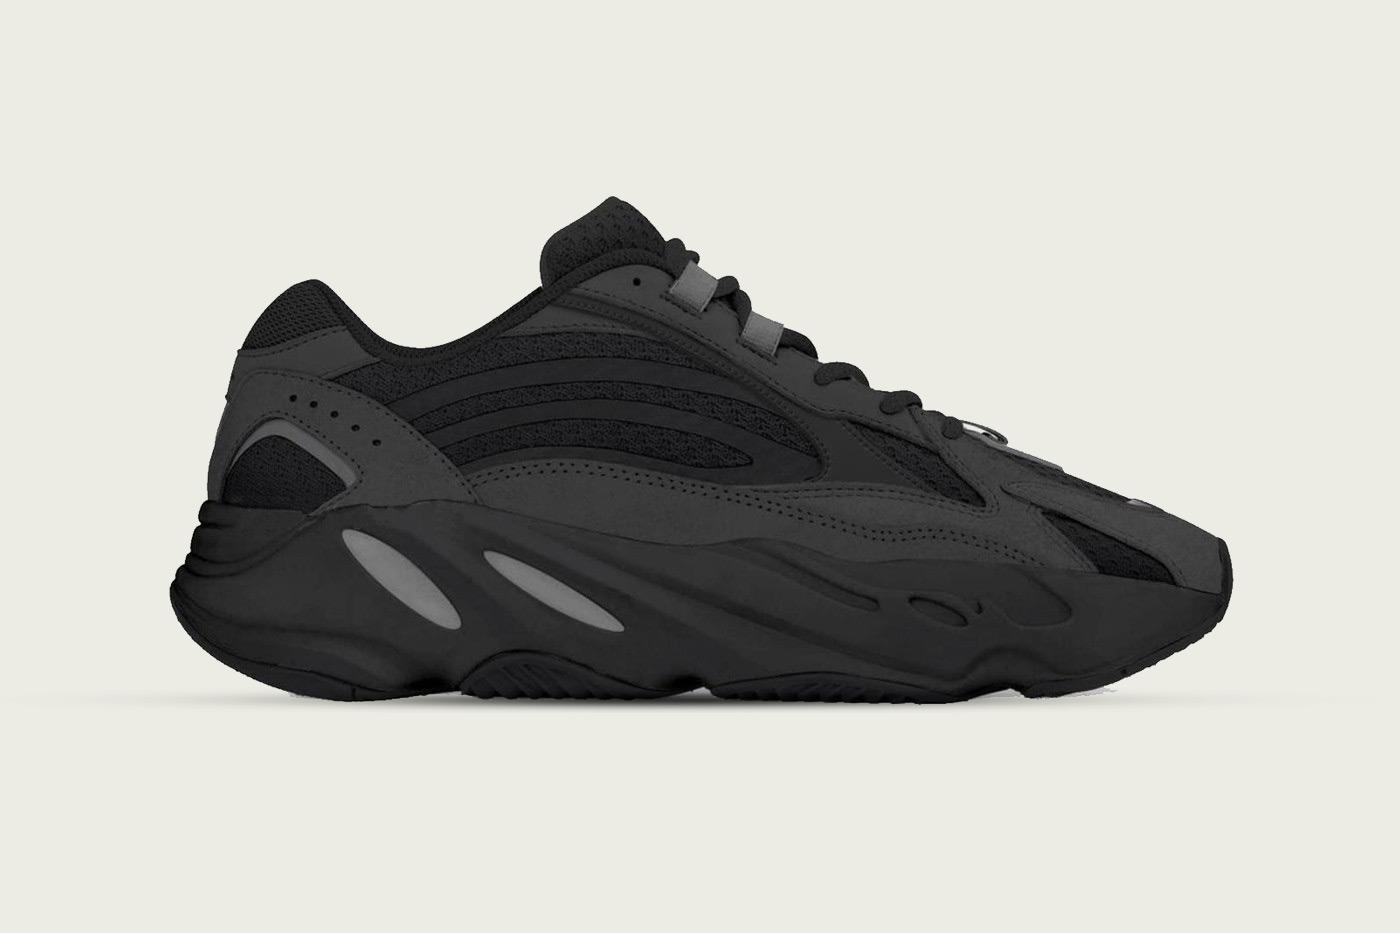 adidas Yeezy Boost 700 V2 Vanta 1